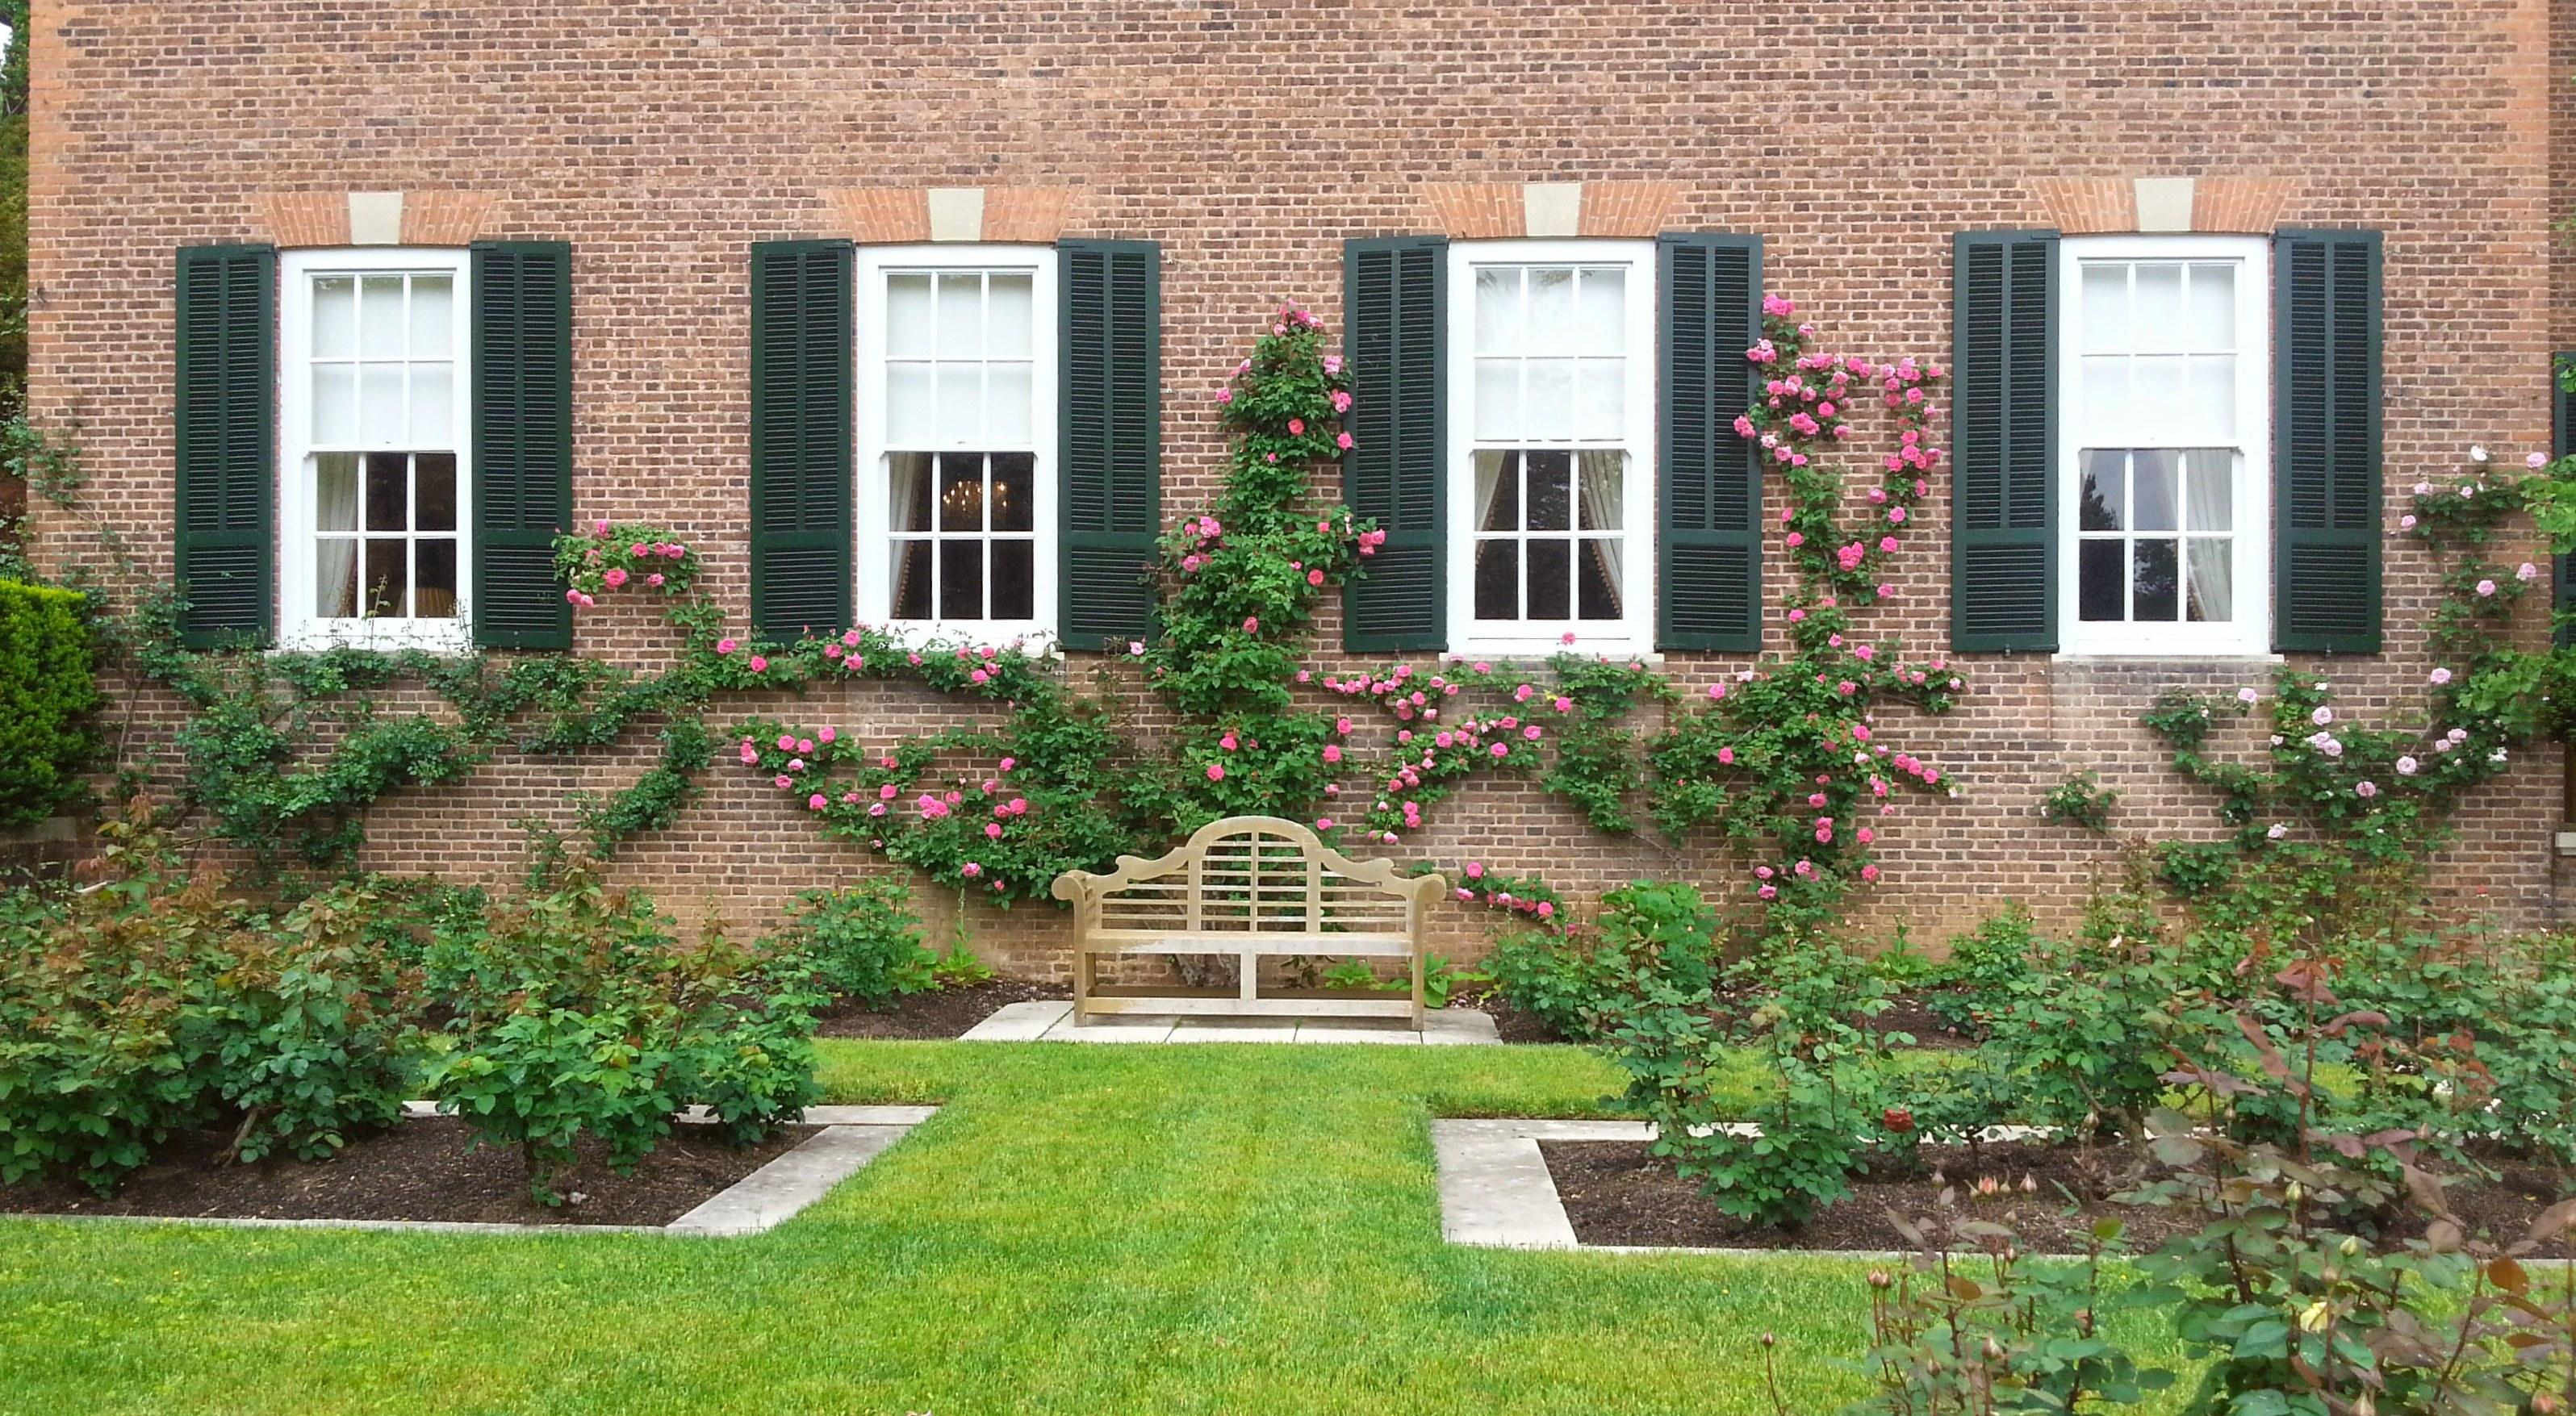 British Embassy's Garden